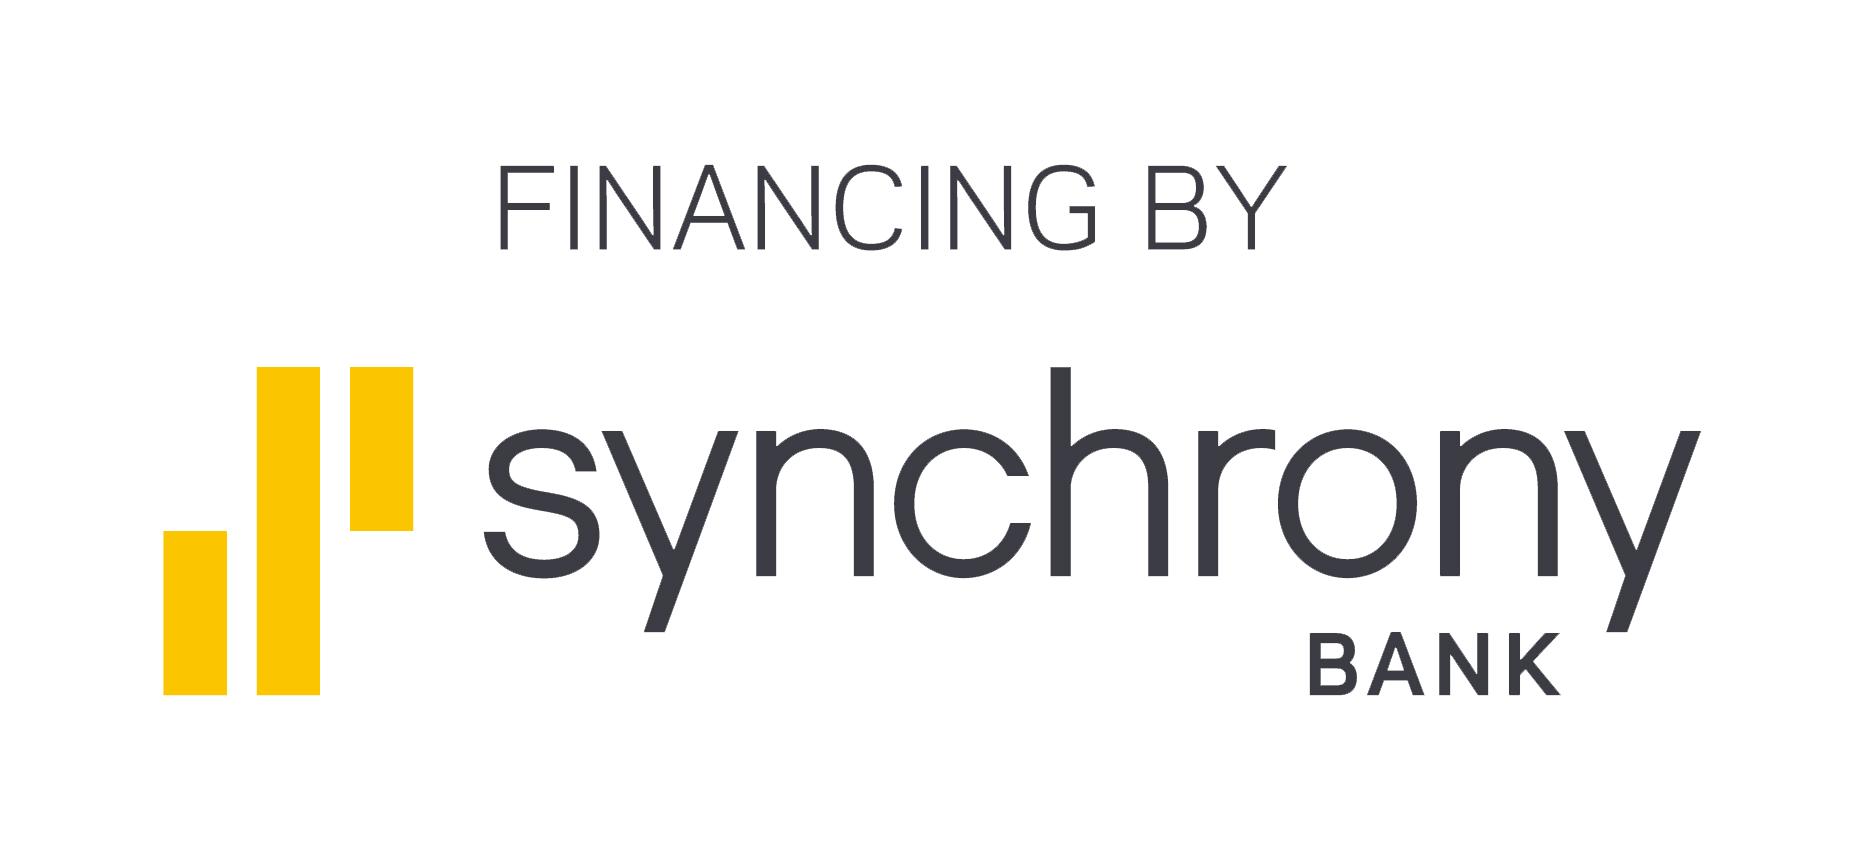 synchrony-bank-logo-financing-dashing-dans-plumbing - Dashing Dan's Plumbing